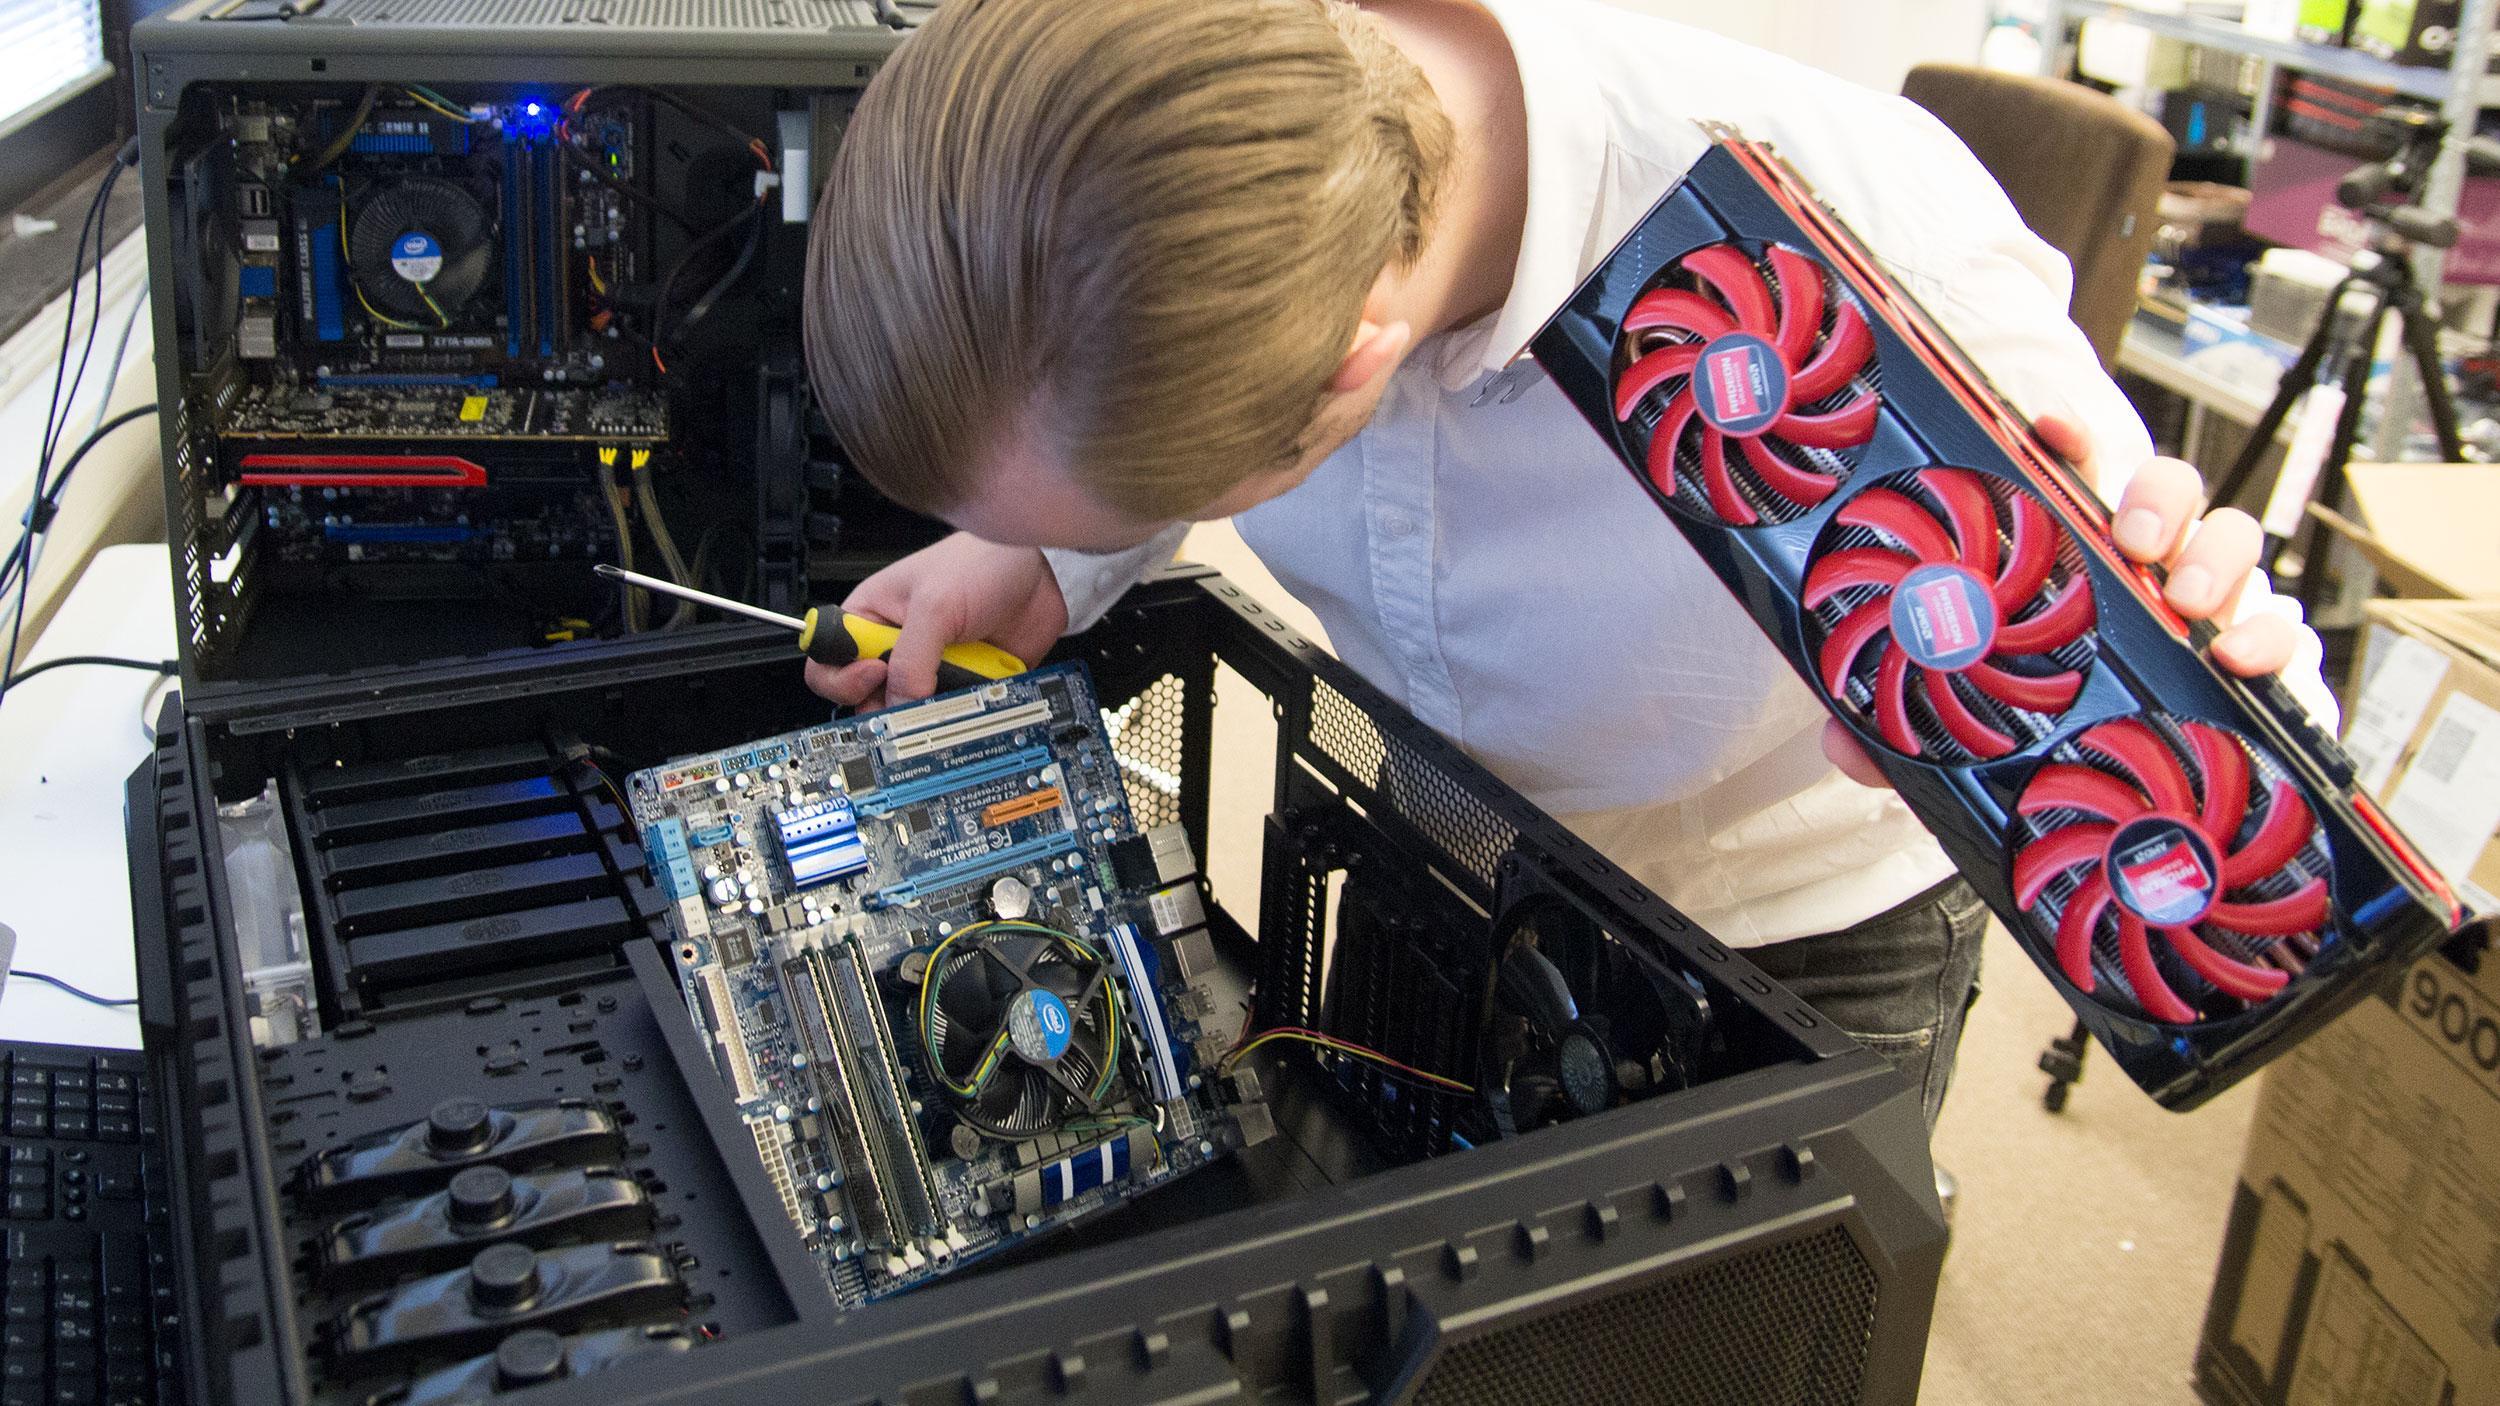 PC-bygging, del 3